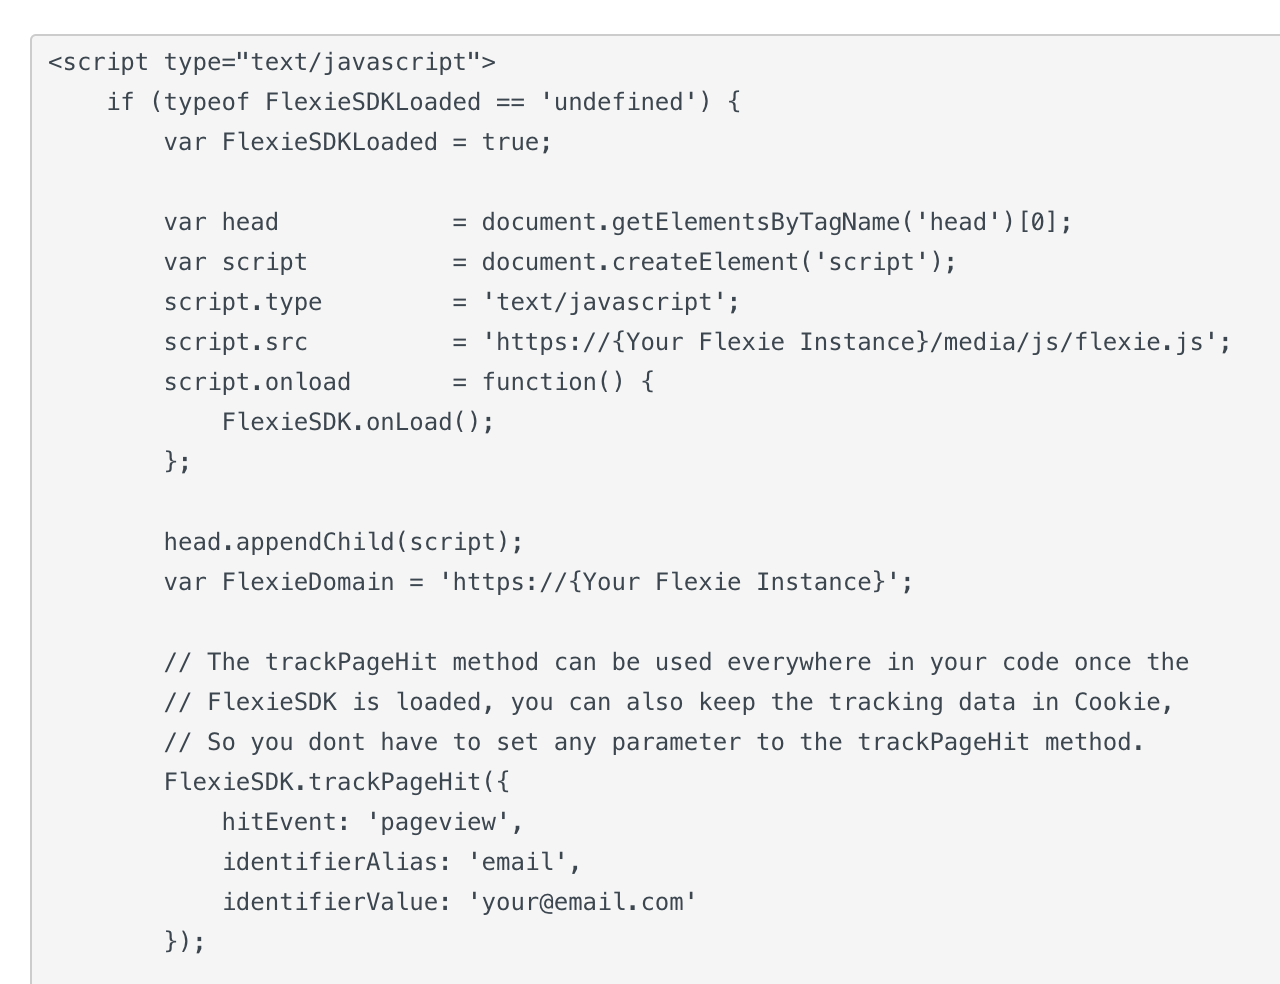 Flexie Tracking Code